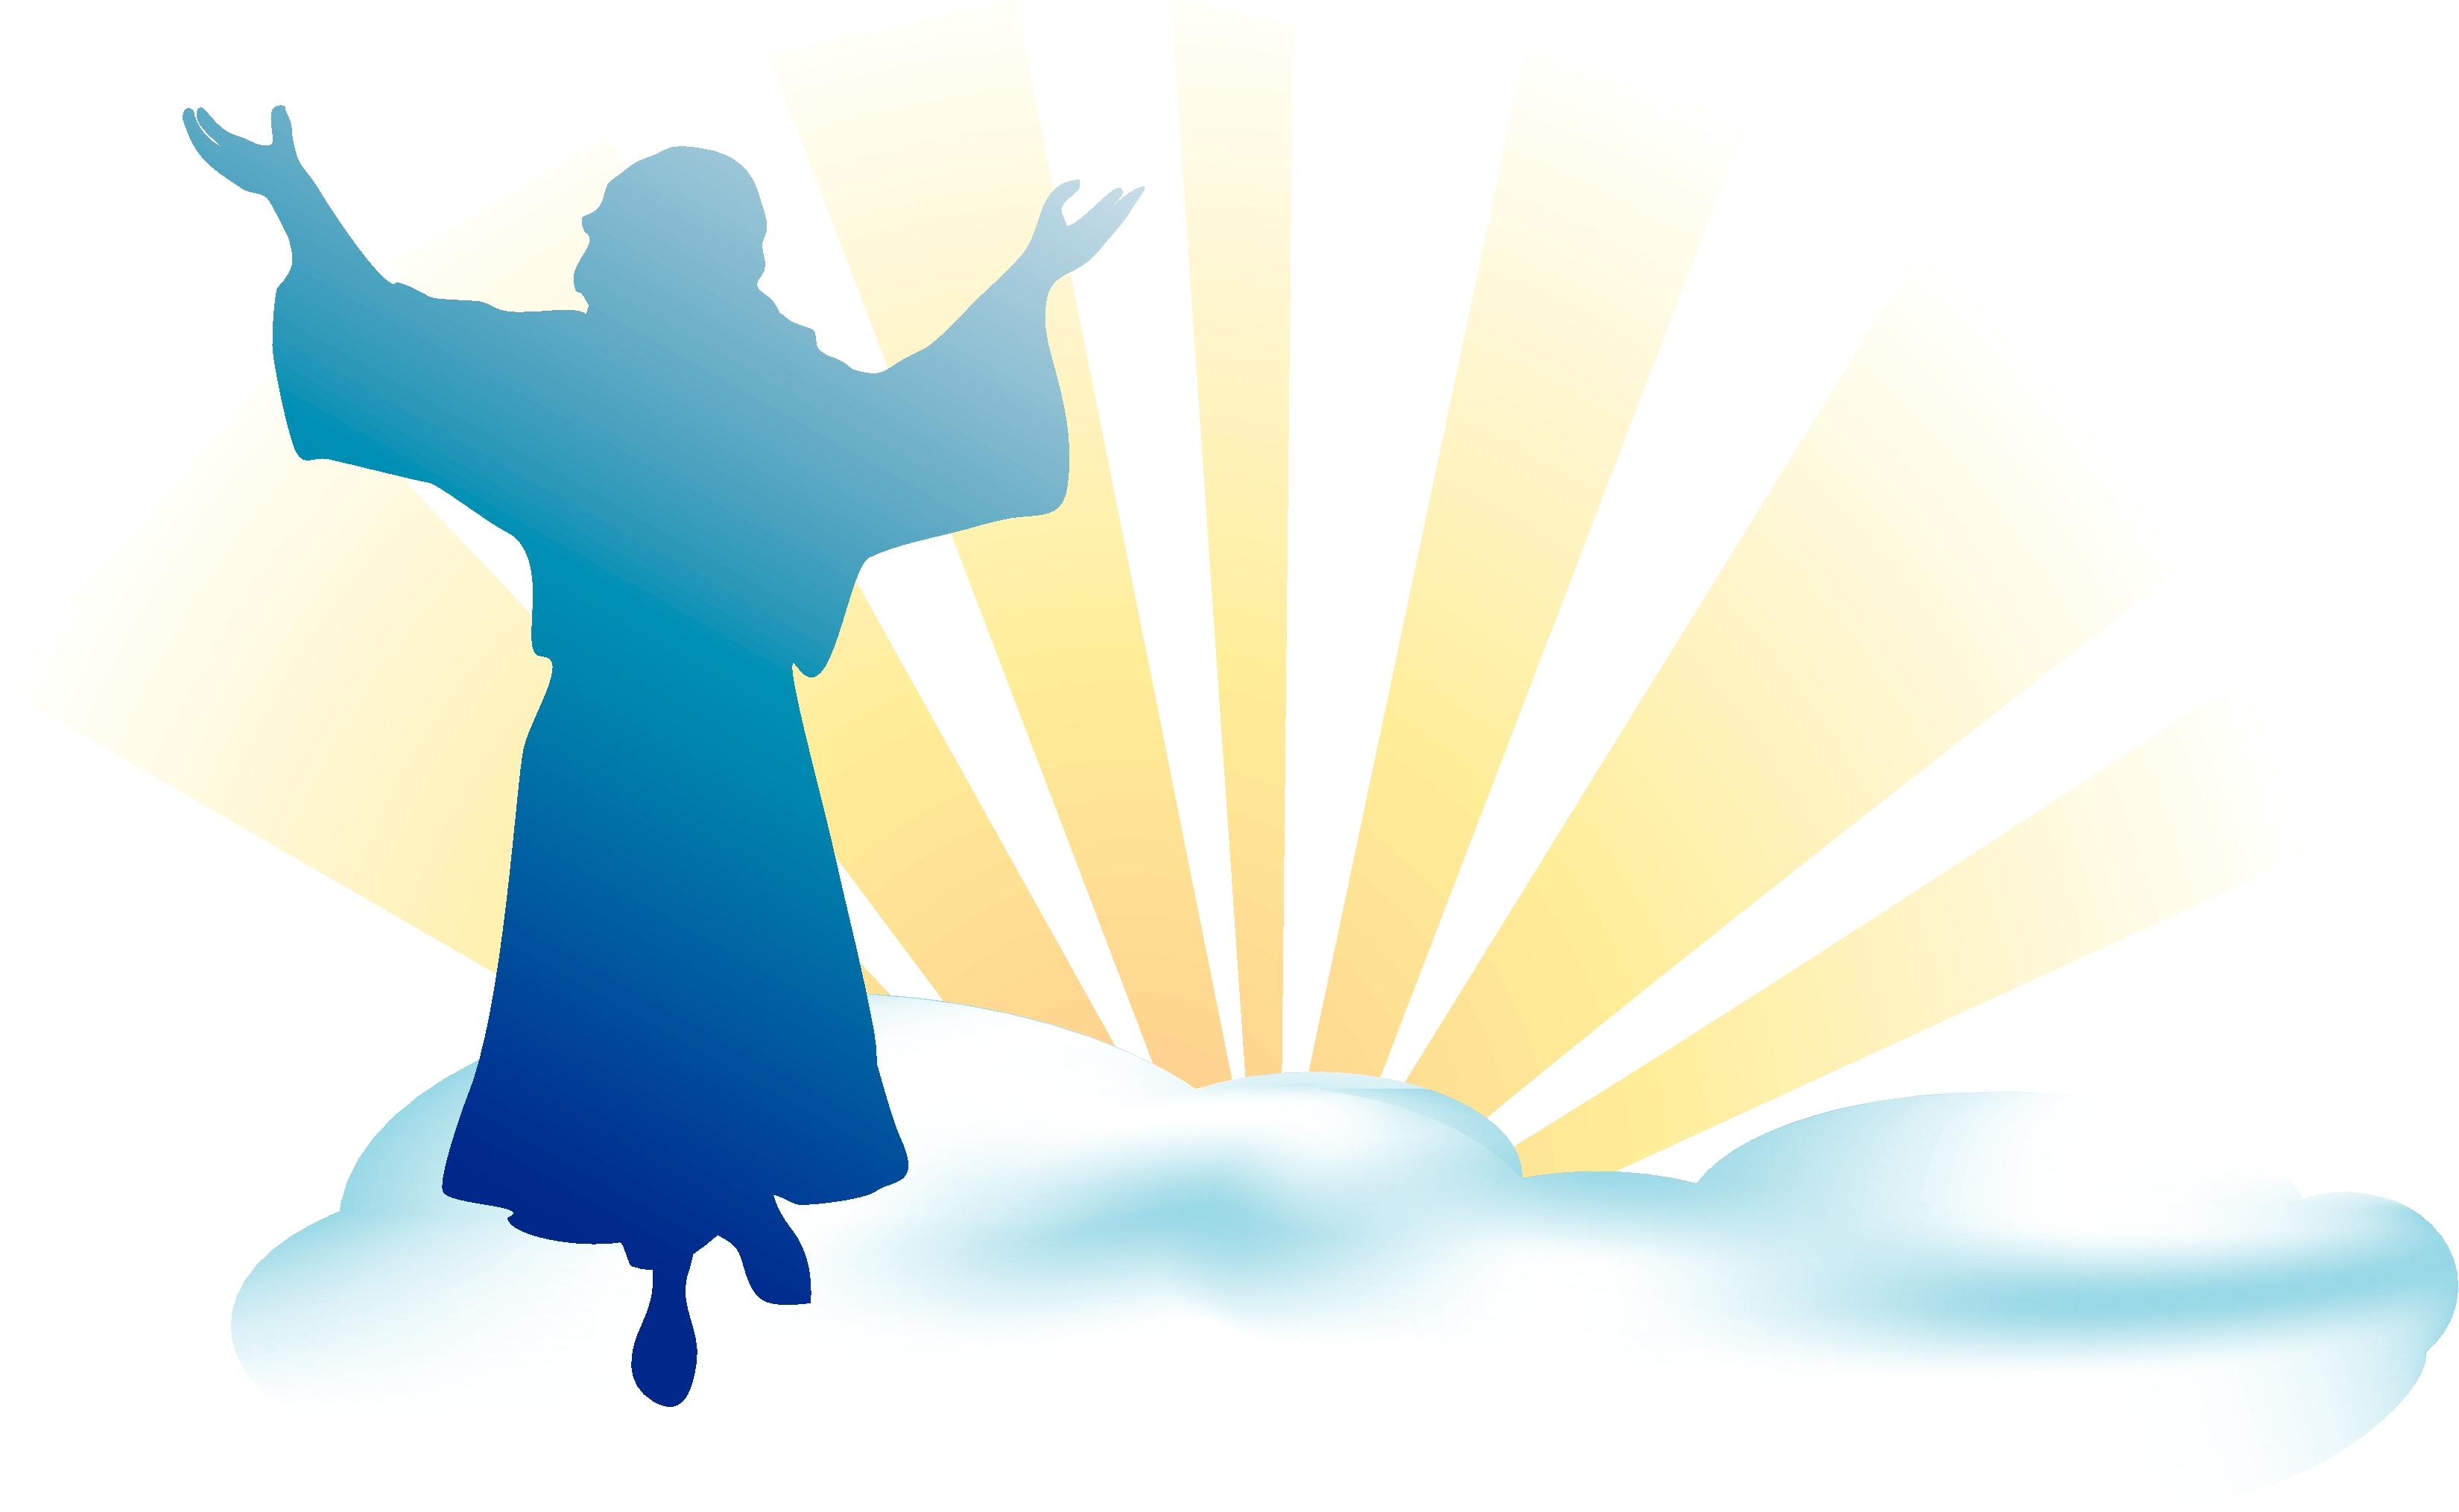 free christian clipart heaven - photo #32